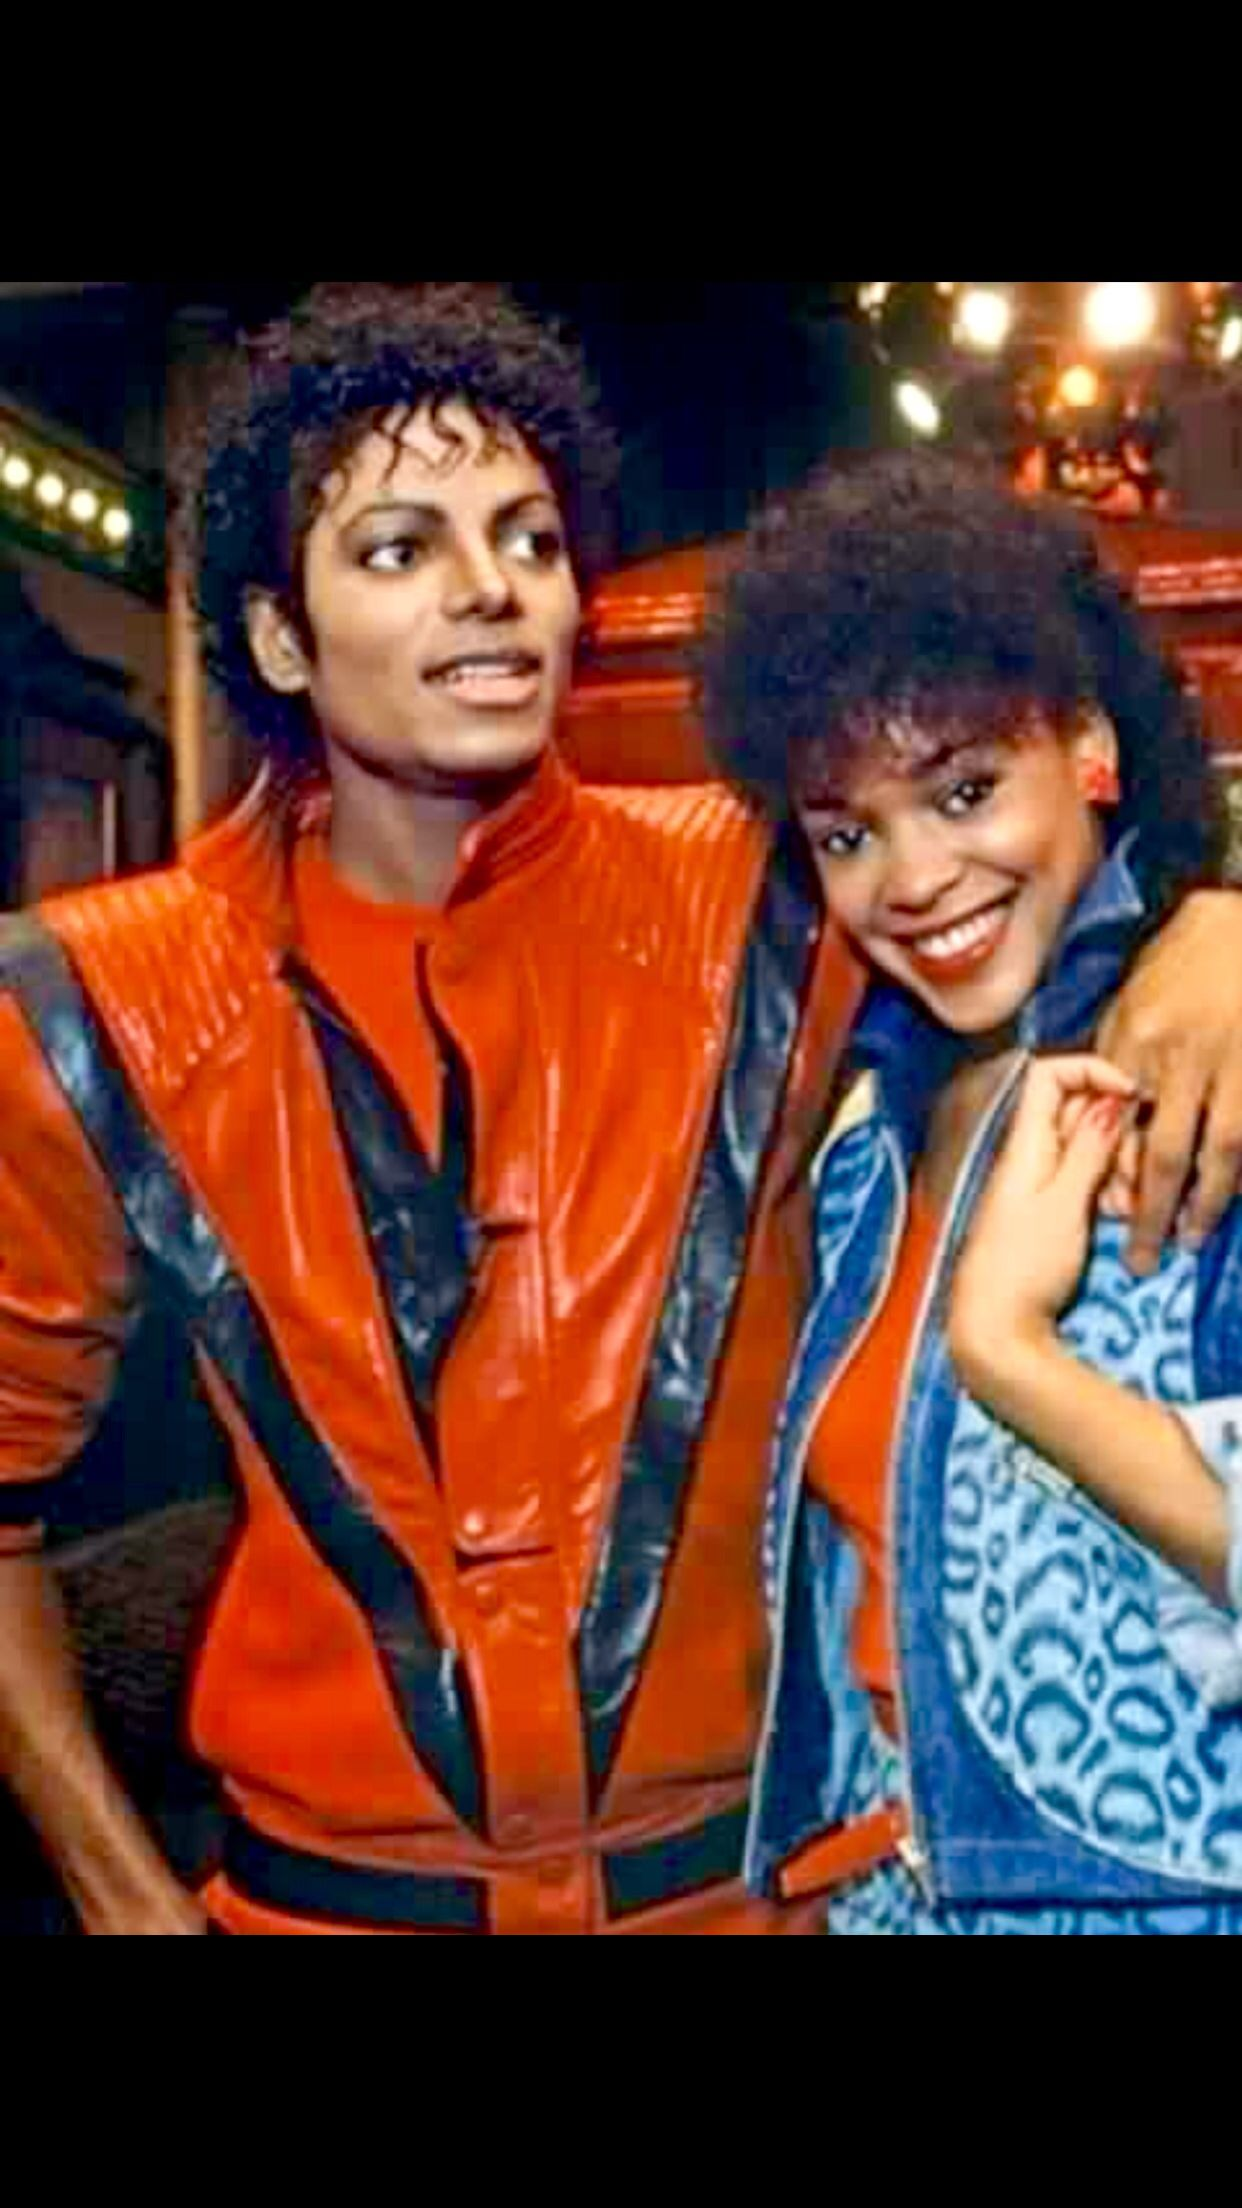 Michael and Ola Ray -Credit: Web Thriller cj <3